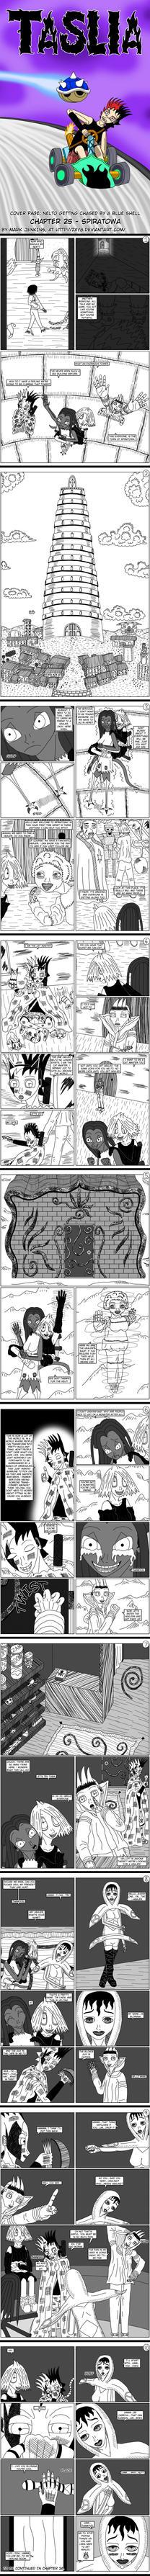 Taslia comic - Chapter 25, by ZXY8 by zxy8